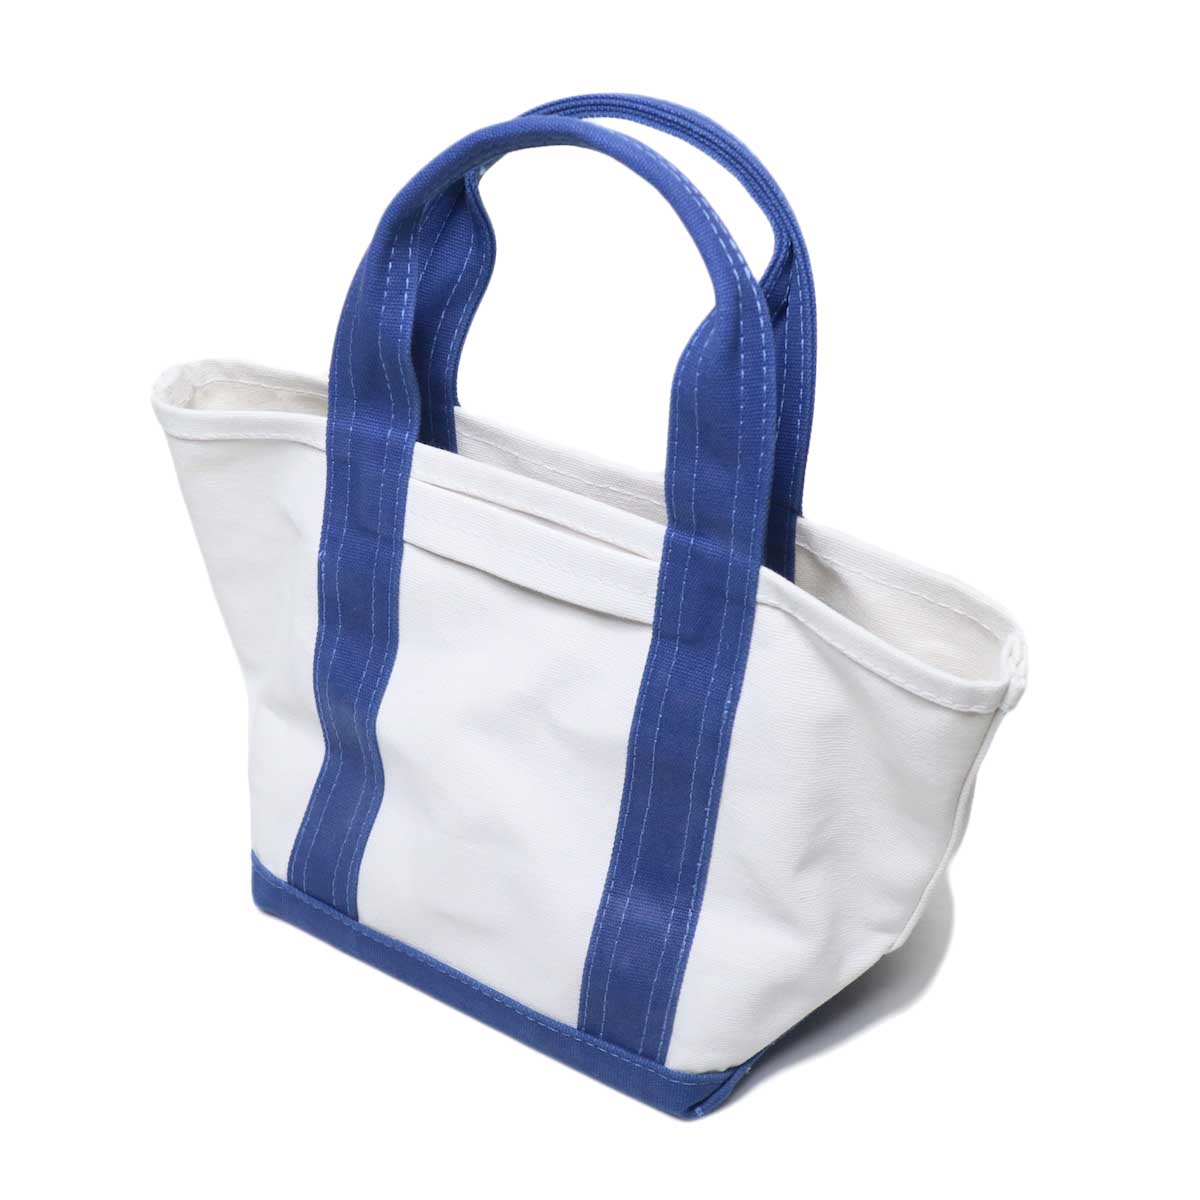 ARMEN / COMBI MINI TOTE BAG (Natural White & Royal)